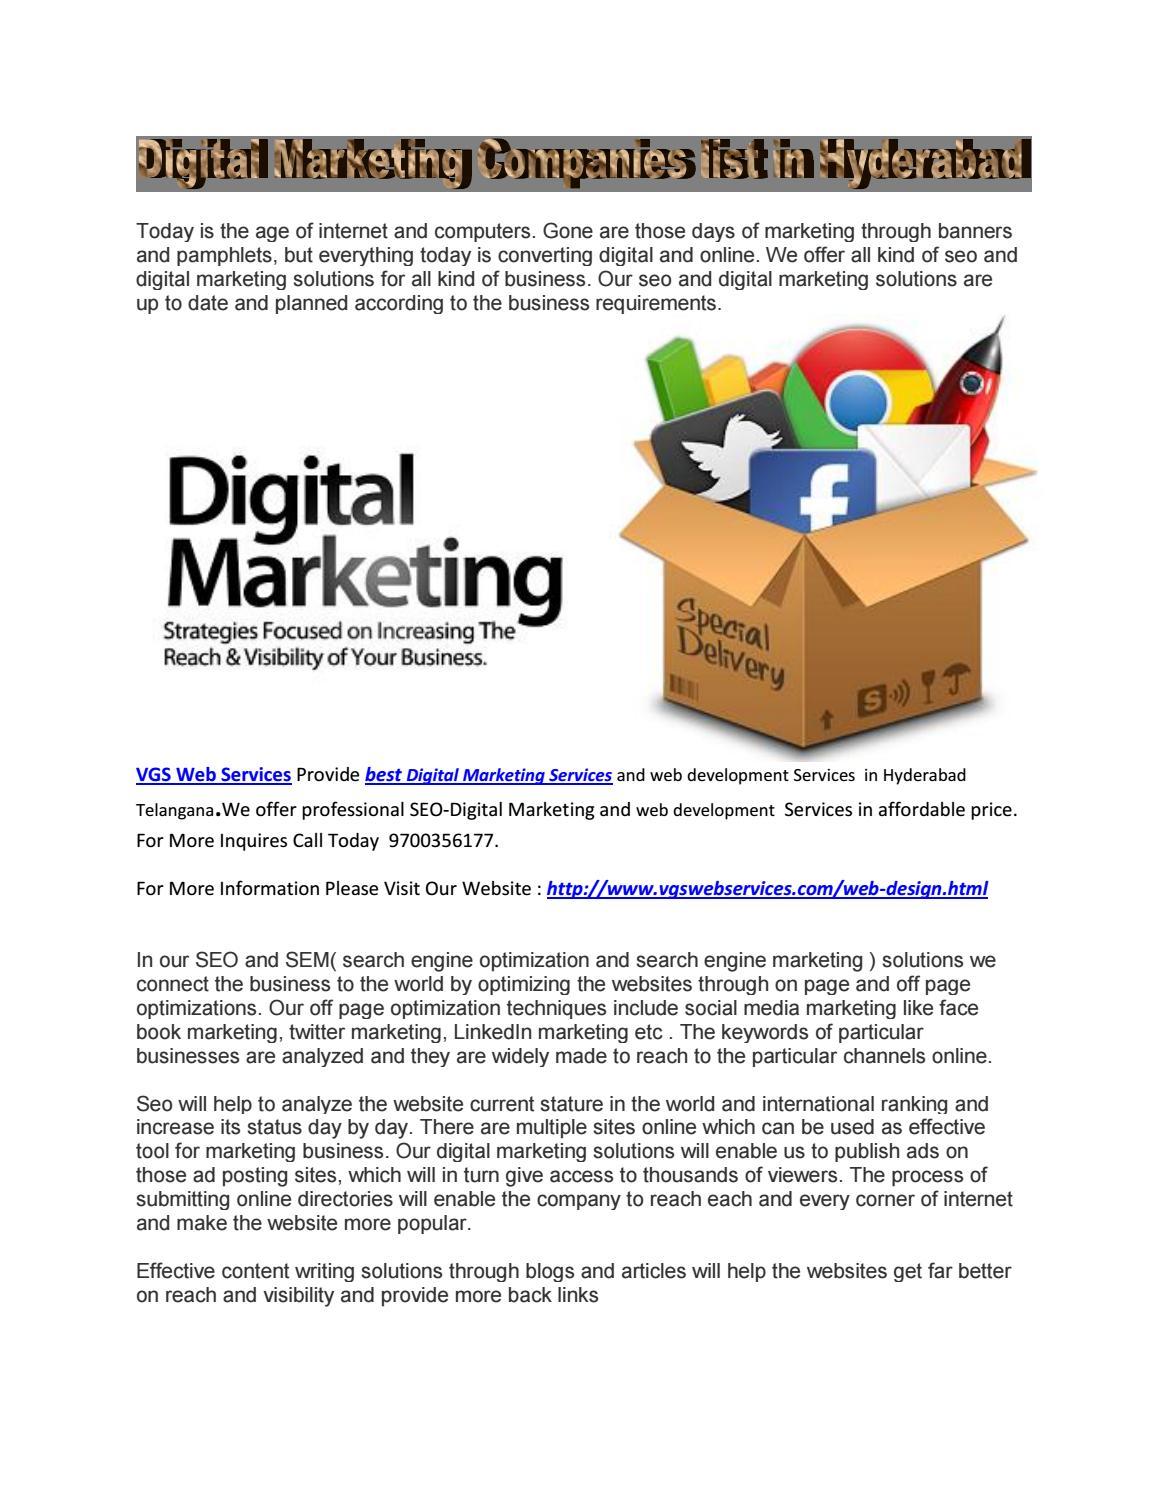 Digital Marketing Companies list in Hyderabad by jackben vgs - issuu